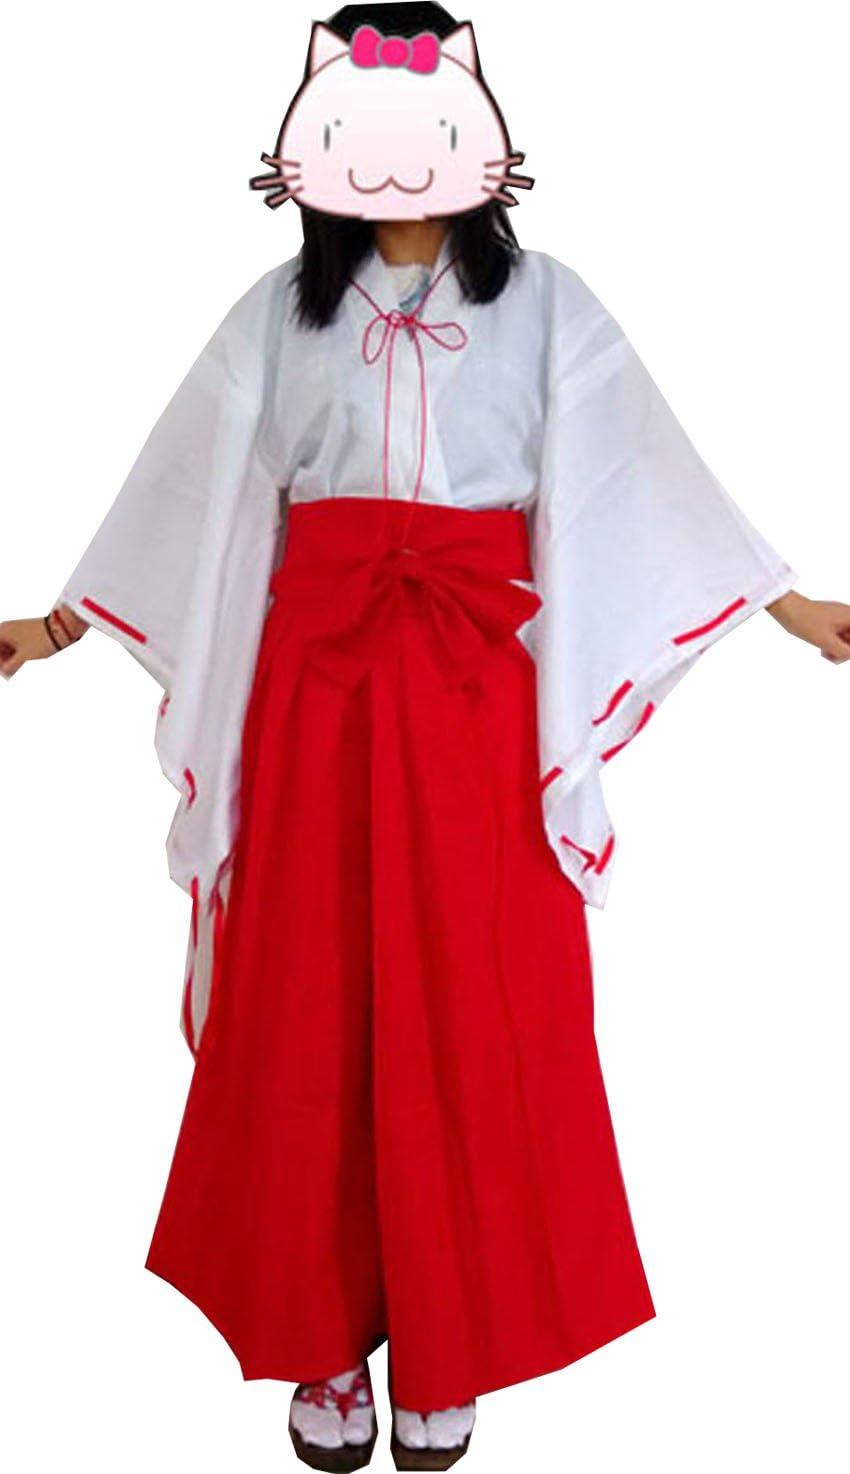 Amazon Com Fantasycart Japanese Anime Inuyasha Psychic Kikyo Kimono Cosplay Costume Small Toys Games